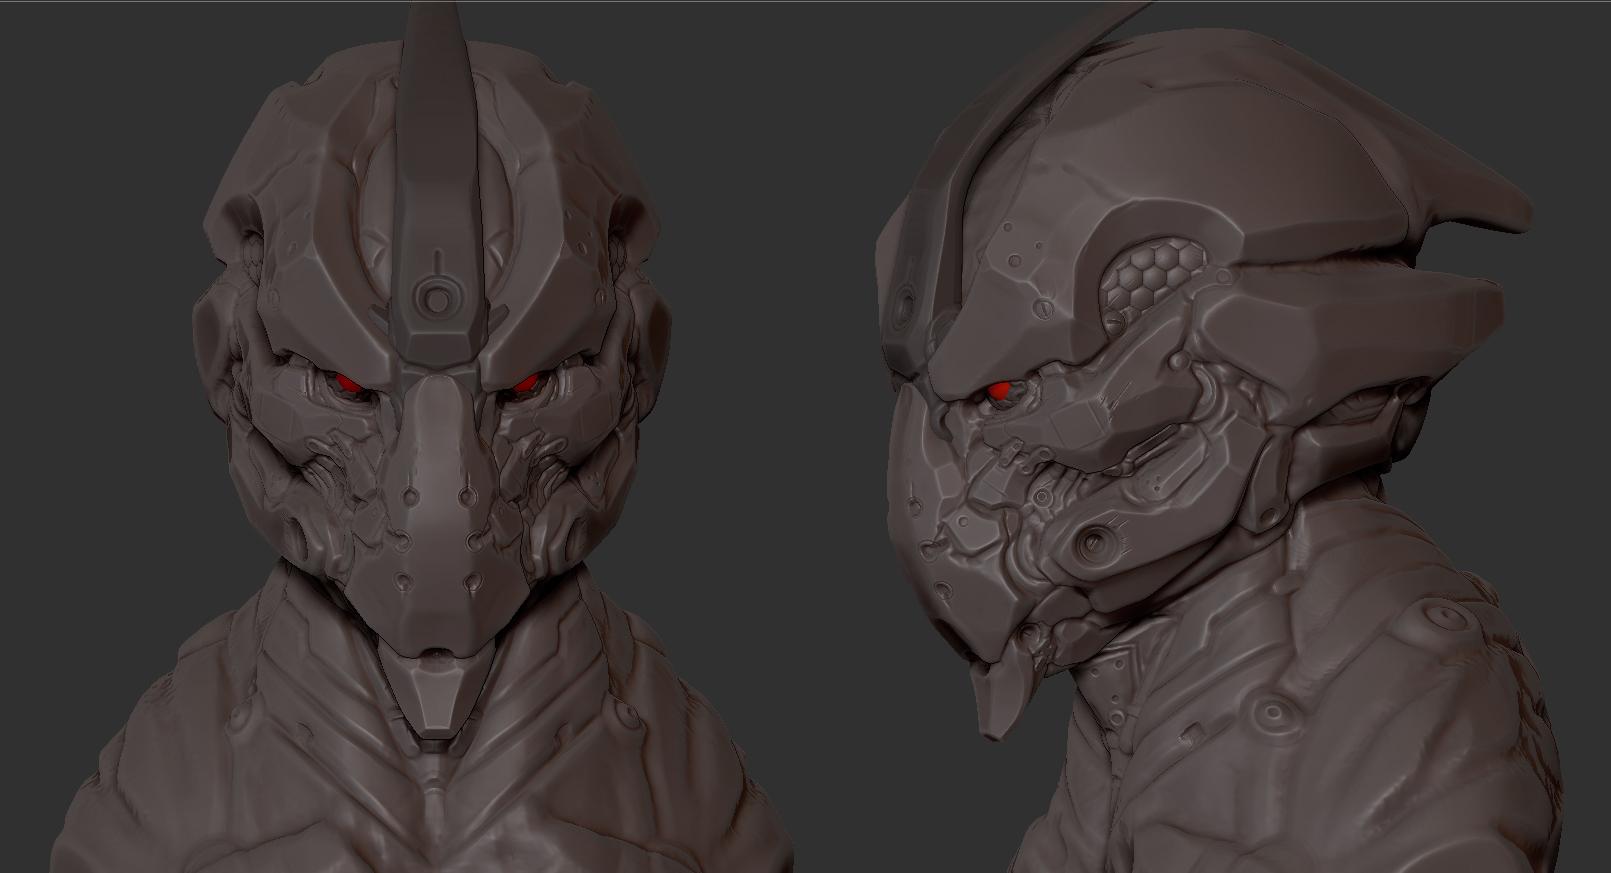 armor_doodle_by_dimidevos-d6v42ta.jpg